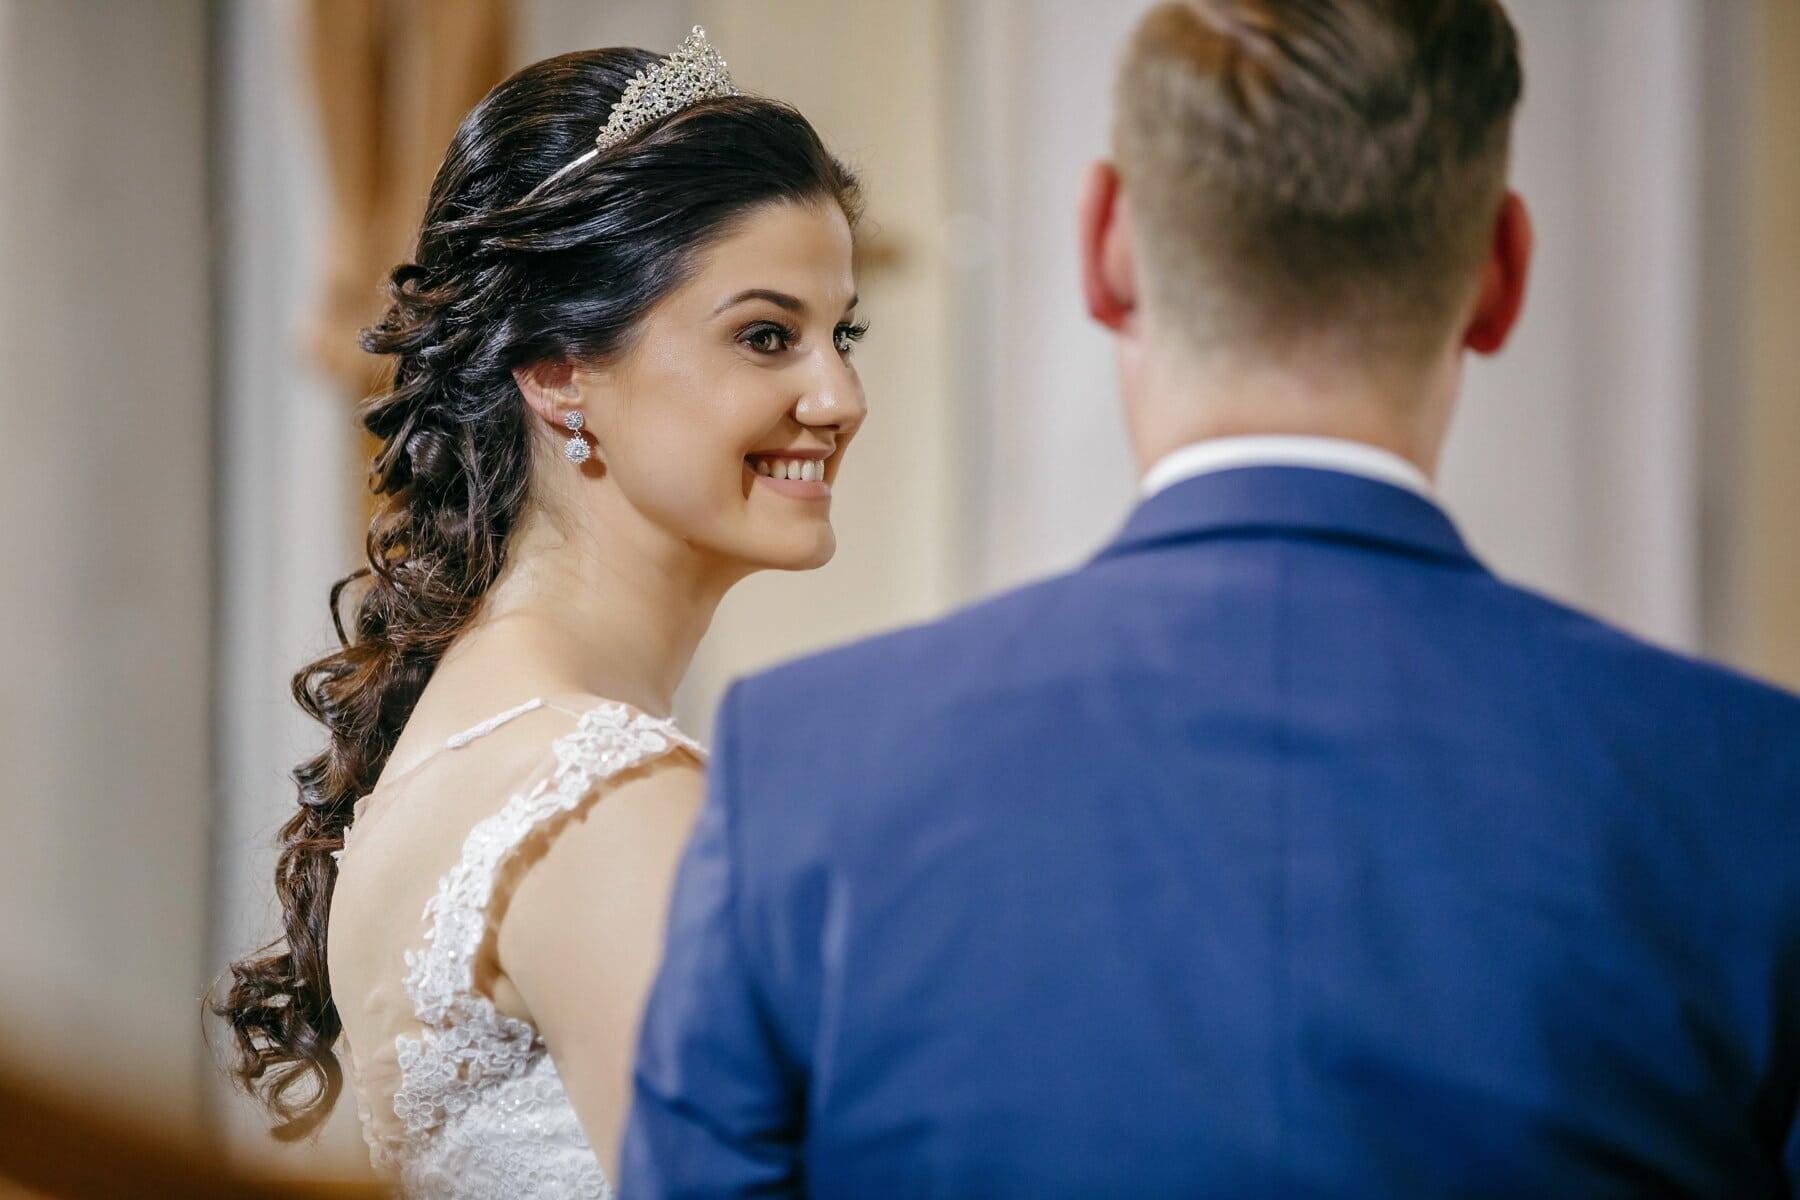 bride, princess, jewelry, crown, groom, wedding, man, fashion, woman, indoors